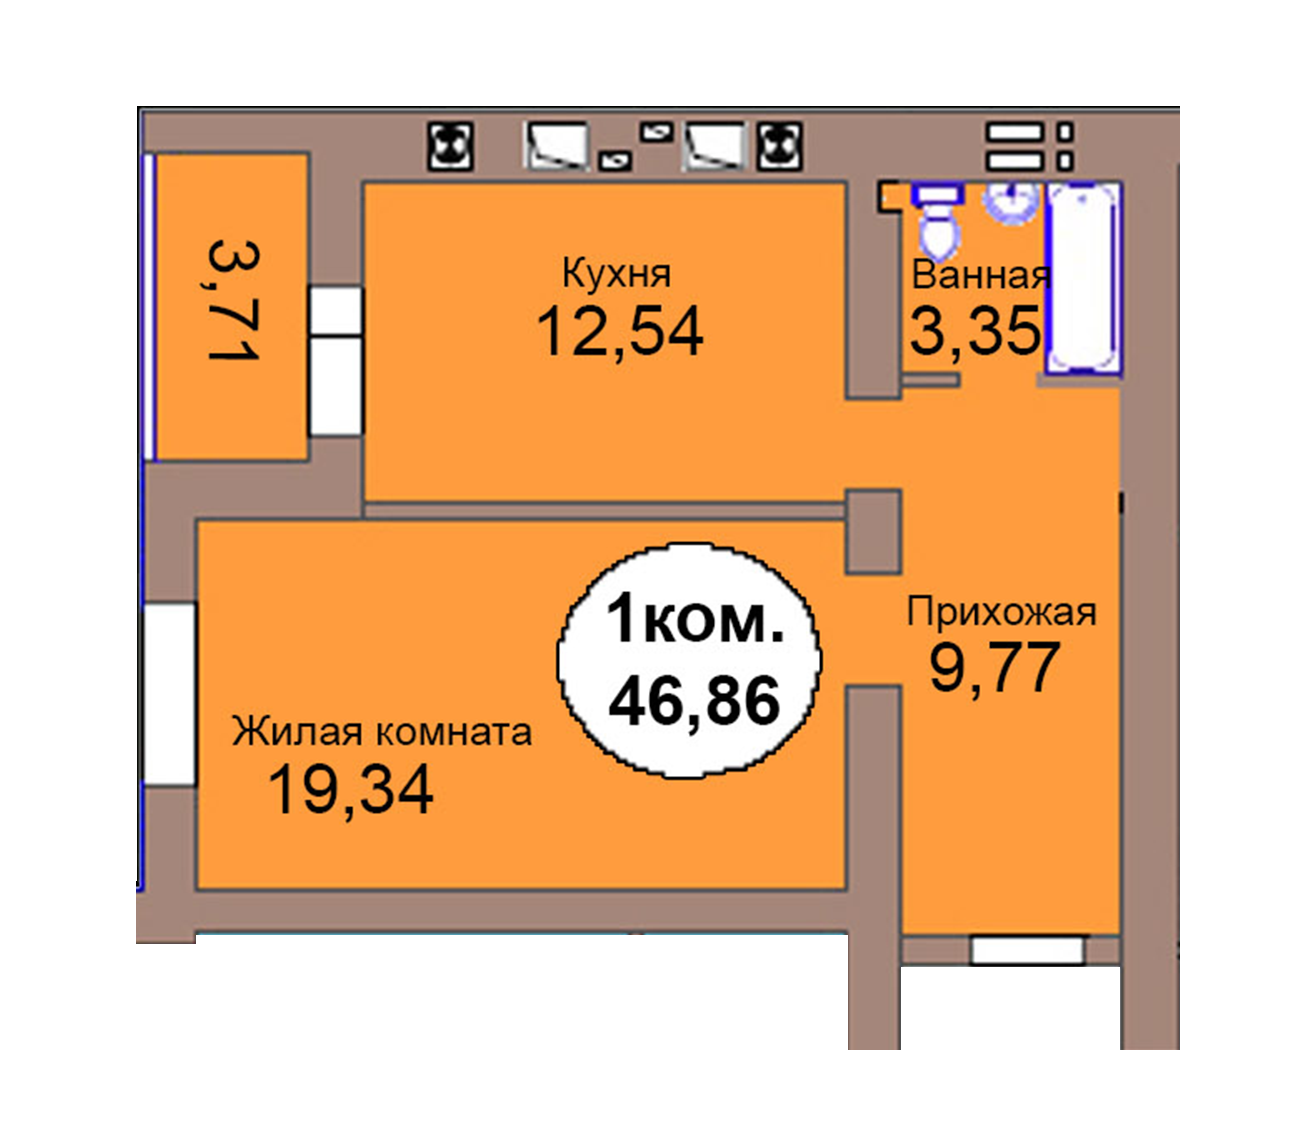 1-комн. кв. по пер. Калининградский, 4  кв. 101 в Калининграде